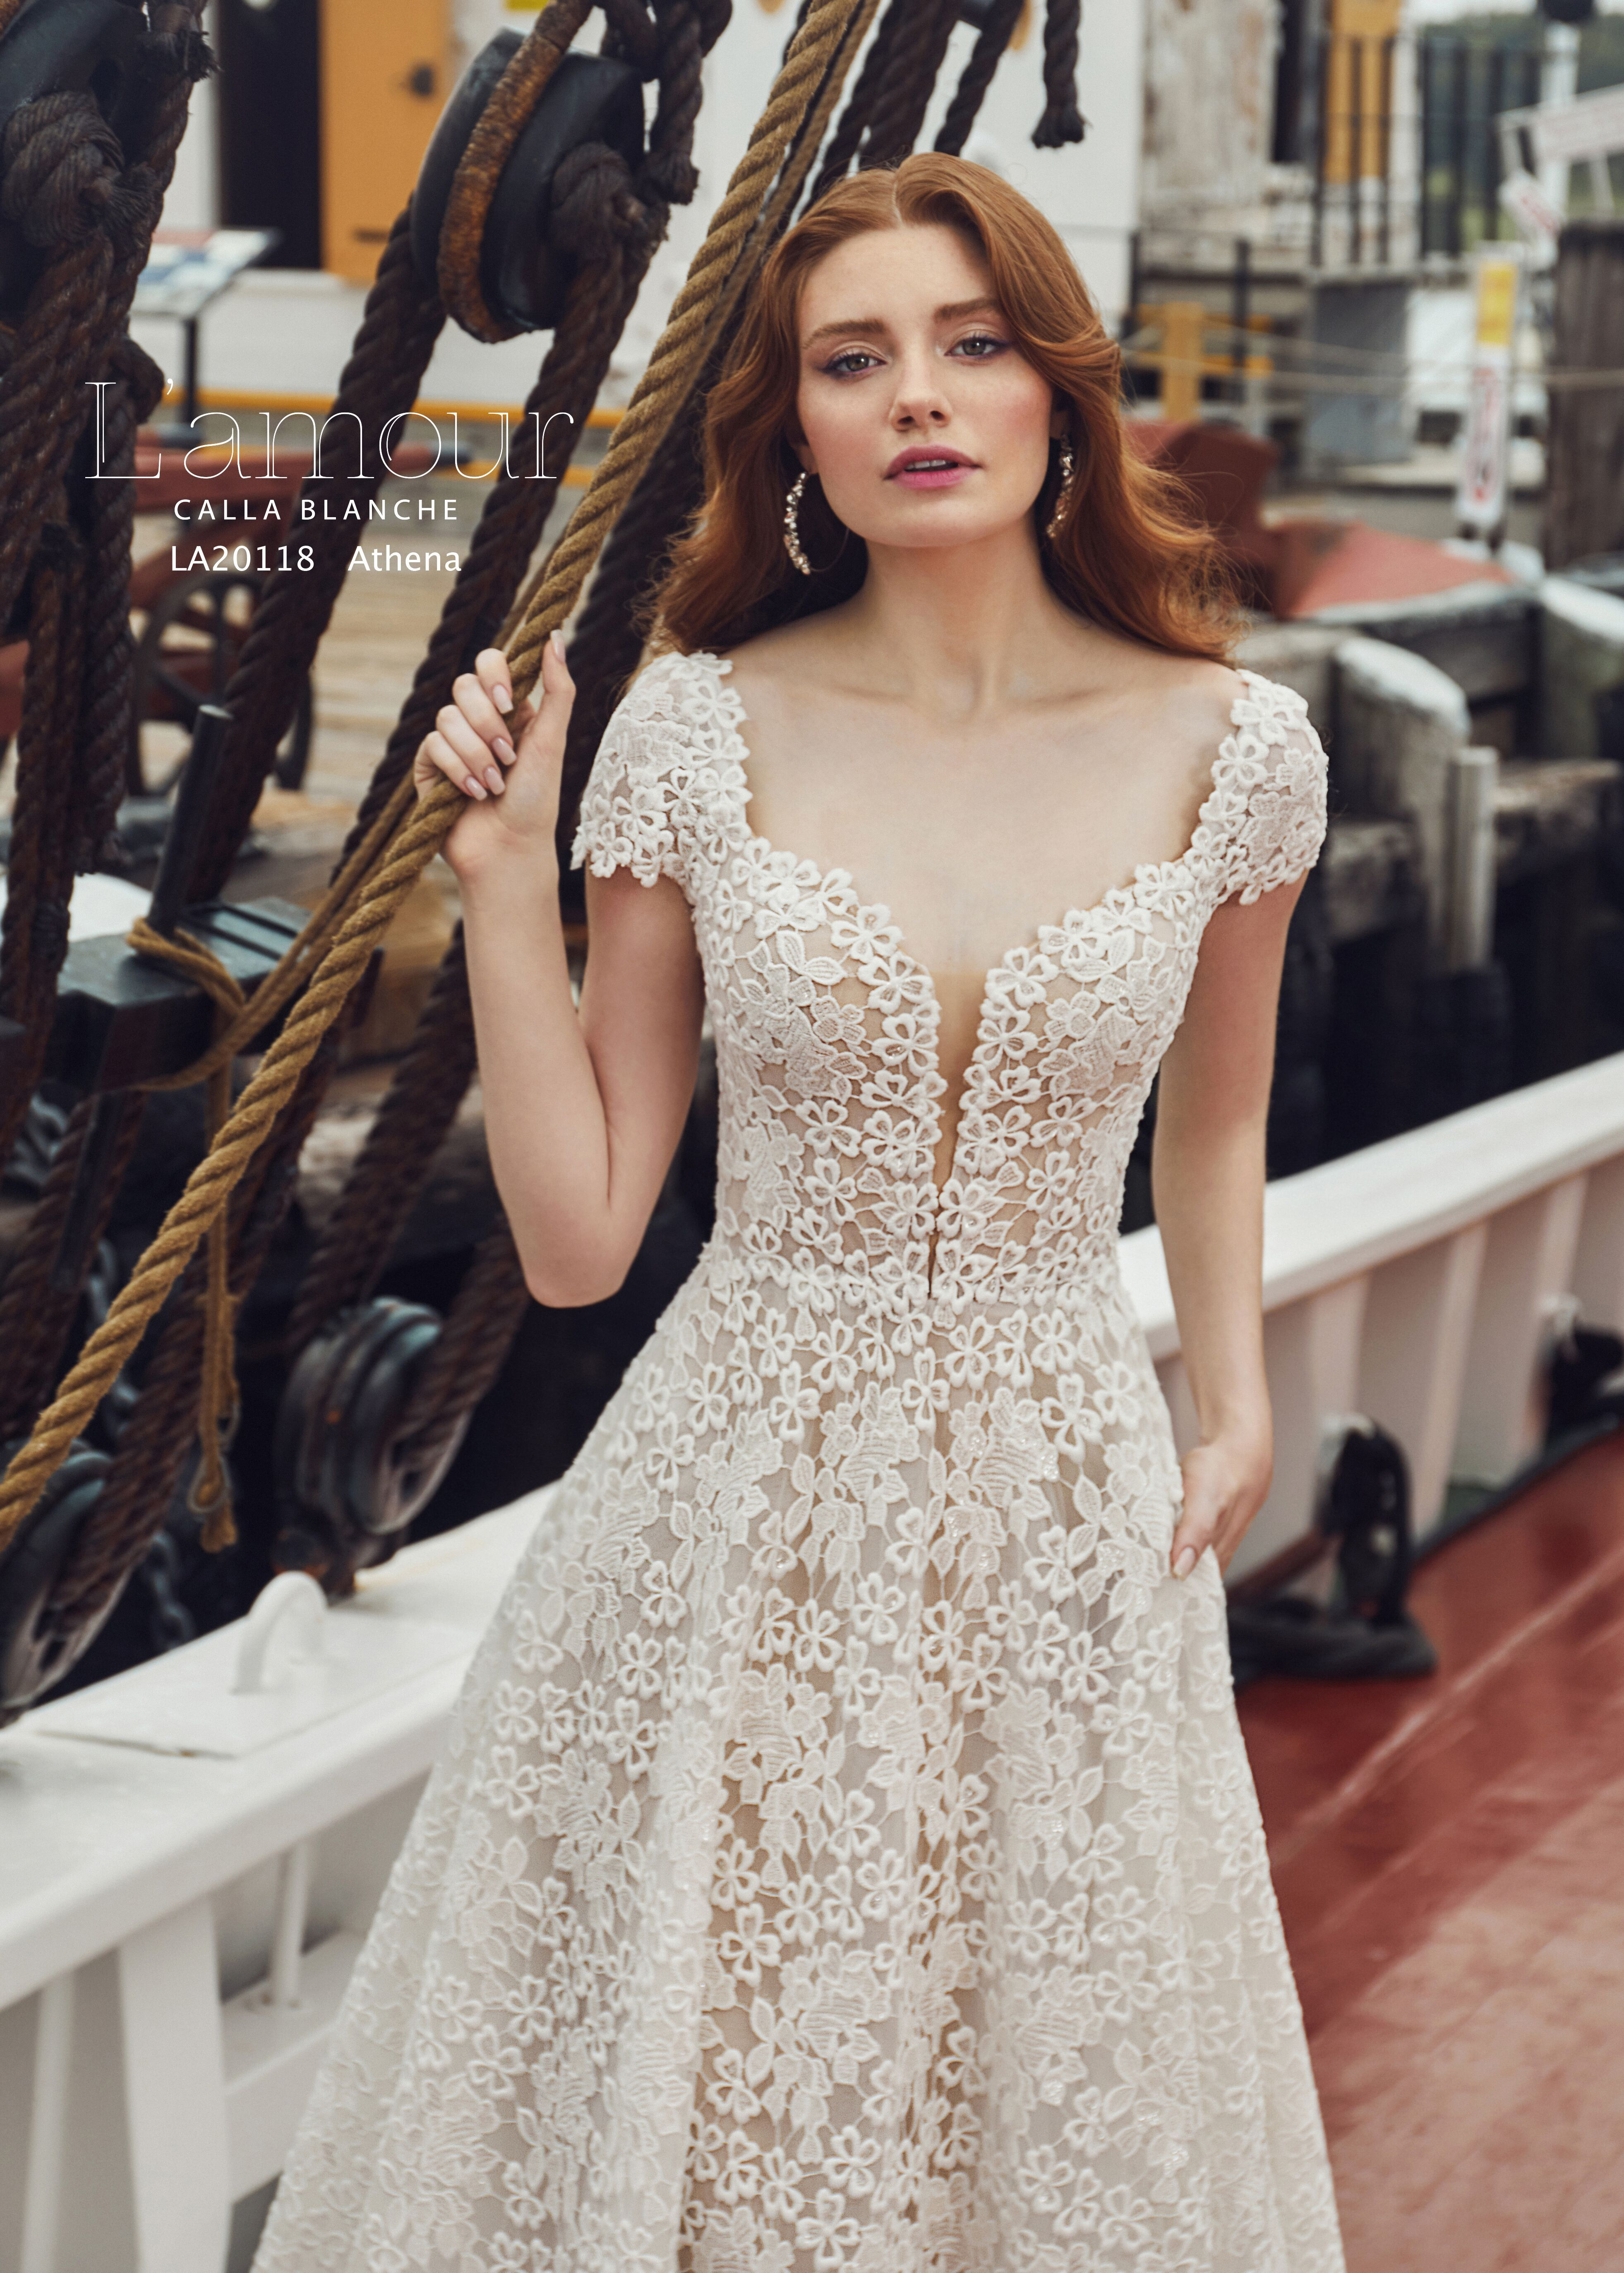 Athena La20118 Lamour Callablanche Utah Wedding Dress Wedding Dress Store Wedding Dresses